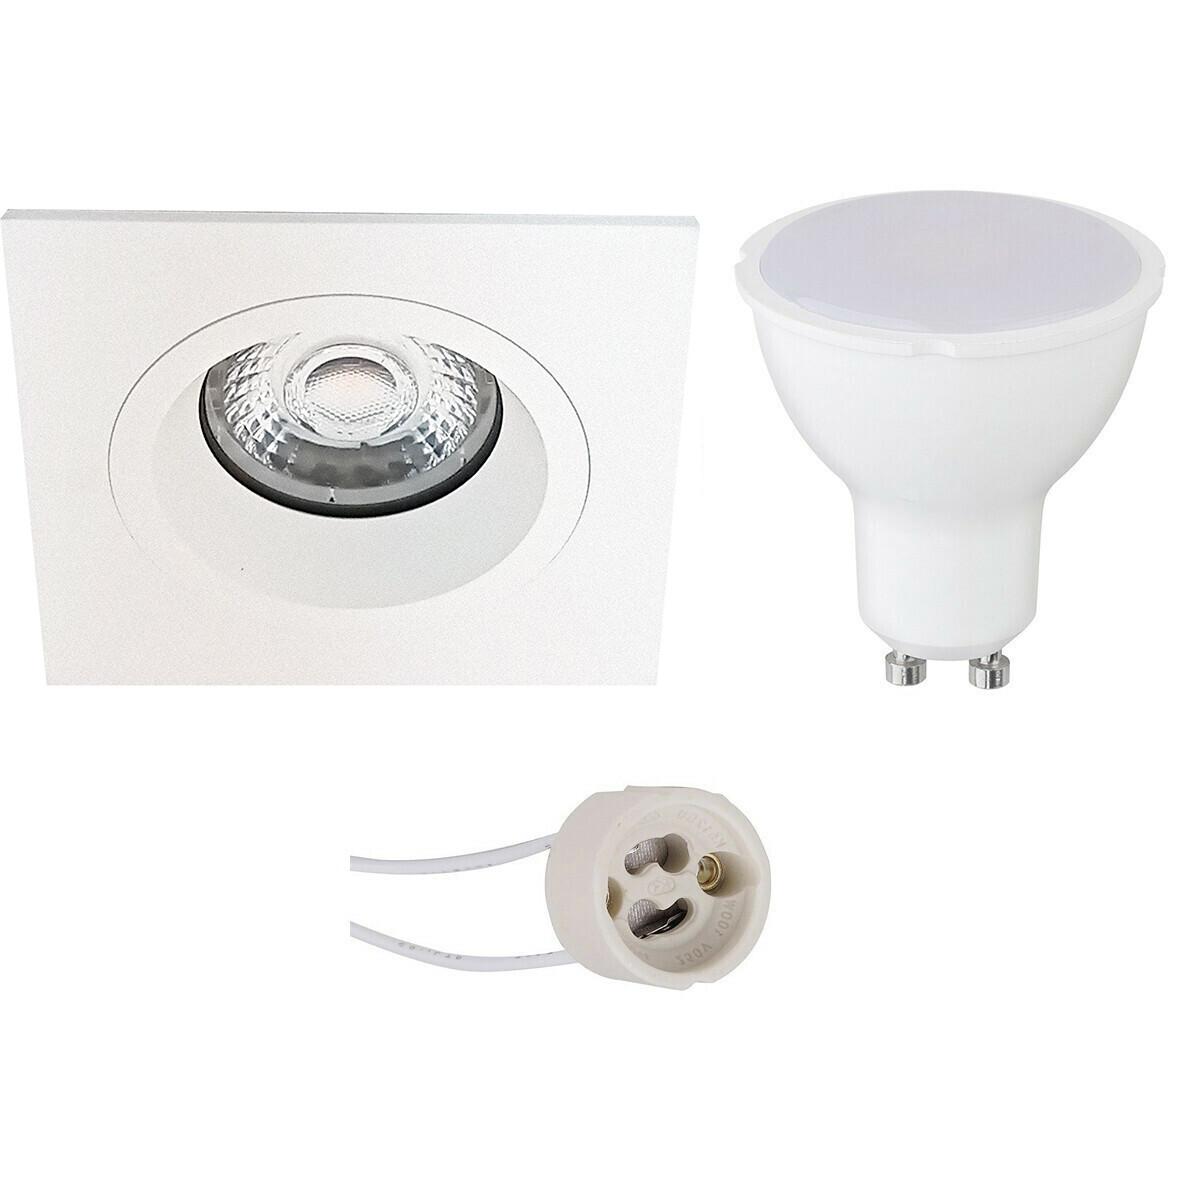 LED Spot Set - Pragmi Rodos Pro - GU10 Fitting - Dimbaar - Inbouw Vierkant - Mat Wit - 6W - Natuurli